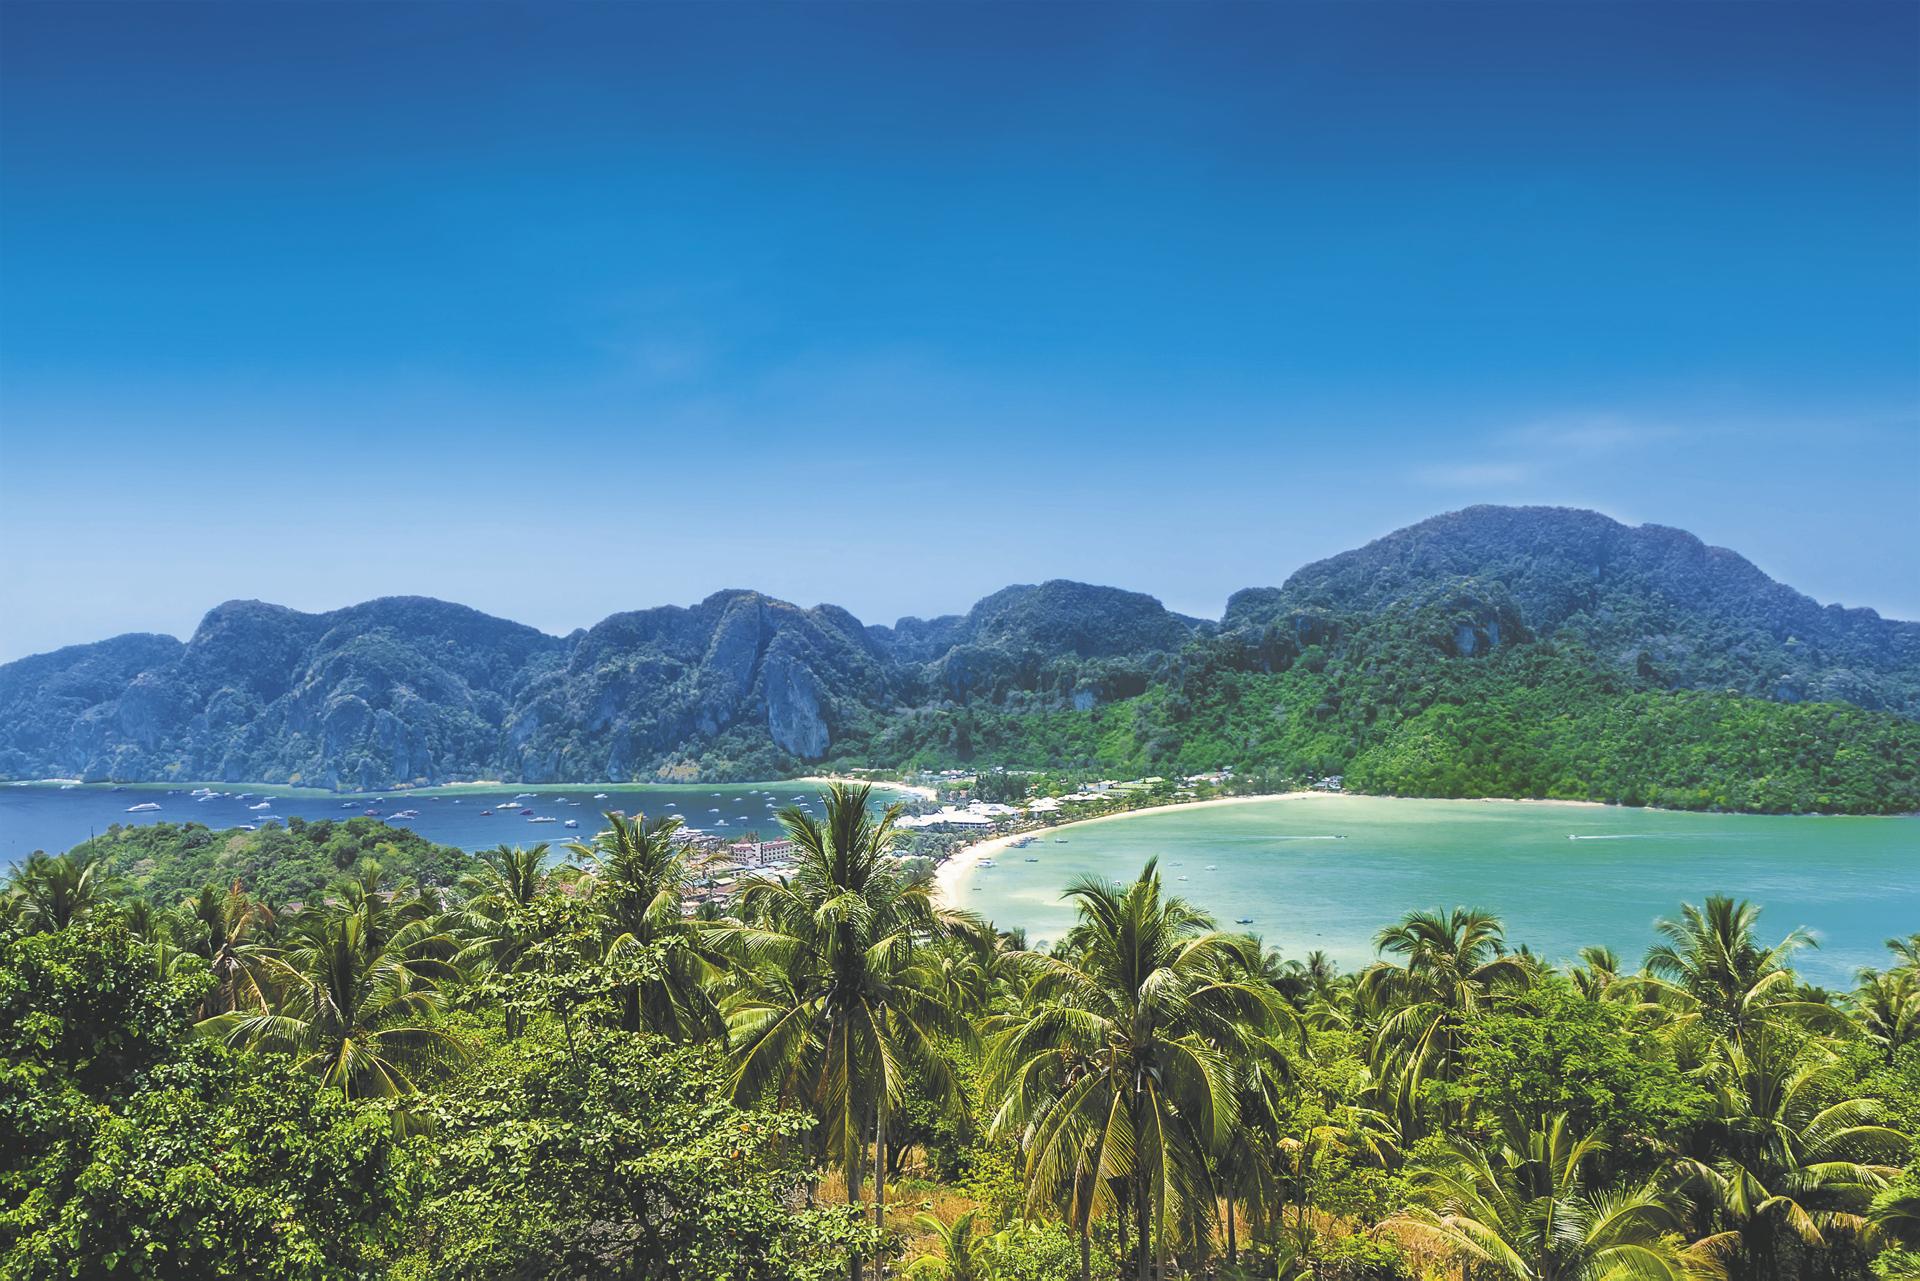 Phi Phi Island bei Krabi - © Preto Perola / Shutterstock